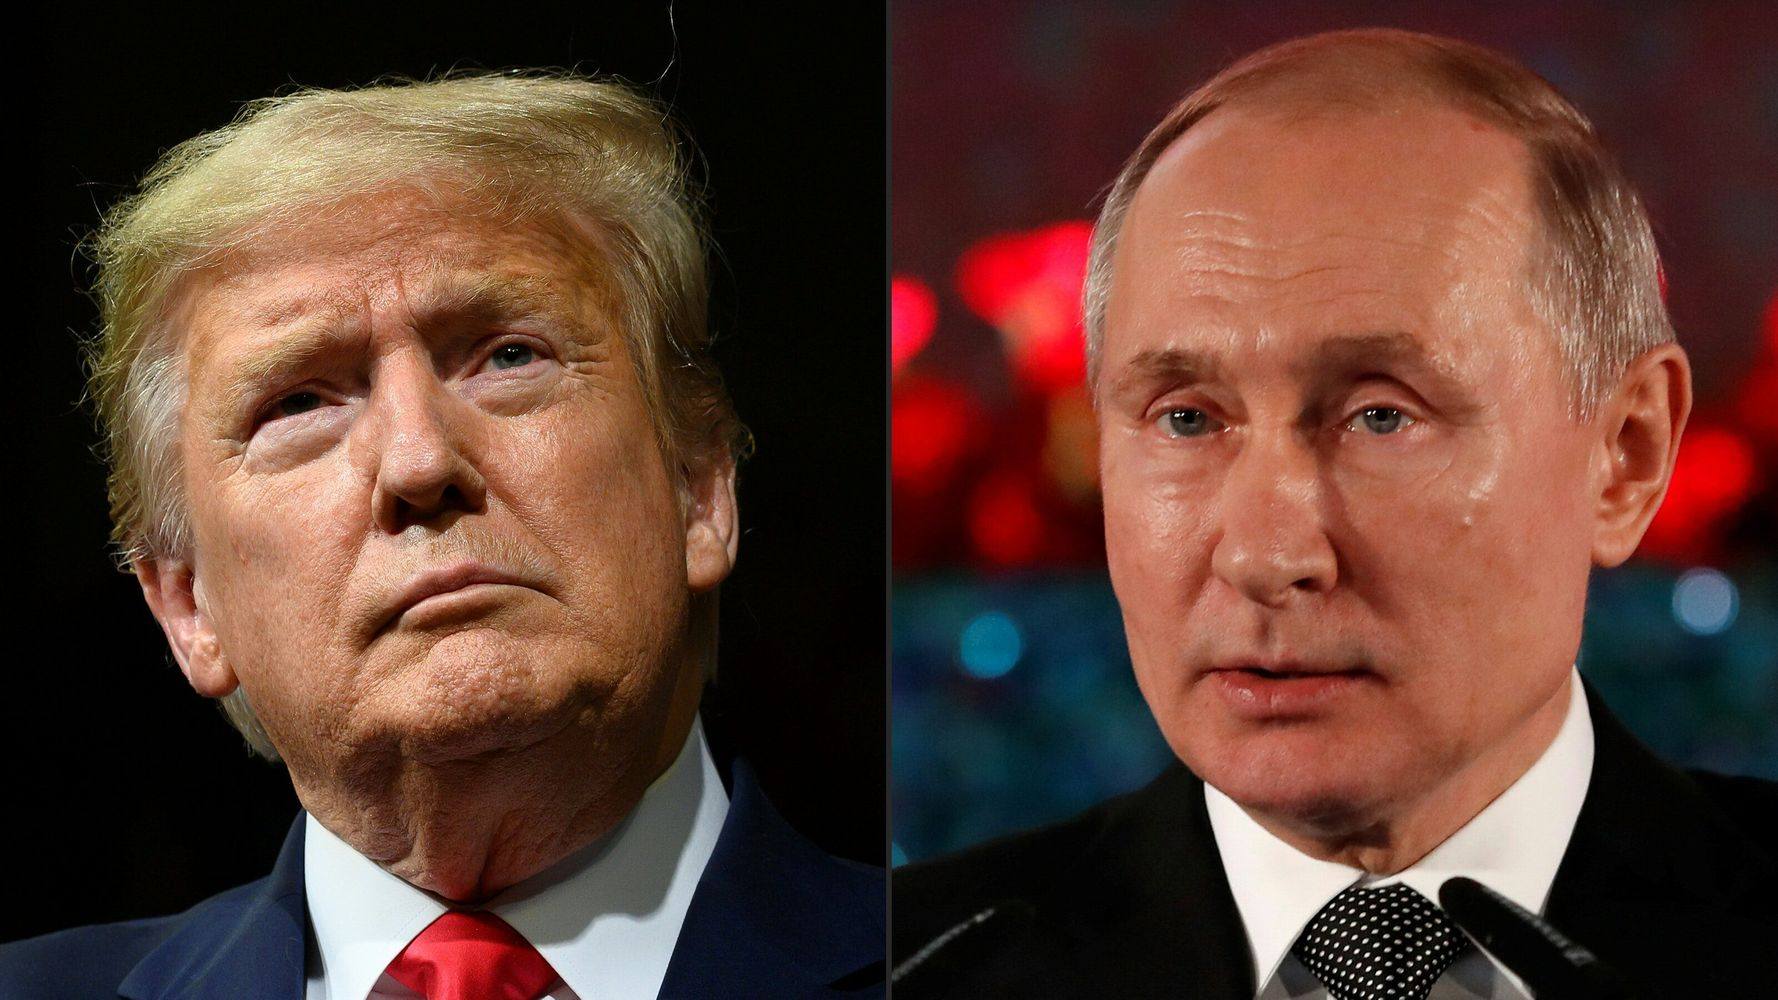 Trump Reminds Us That He Trusts Vladimir Putin More Than U.S. Intelligence